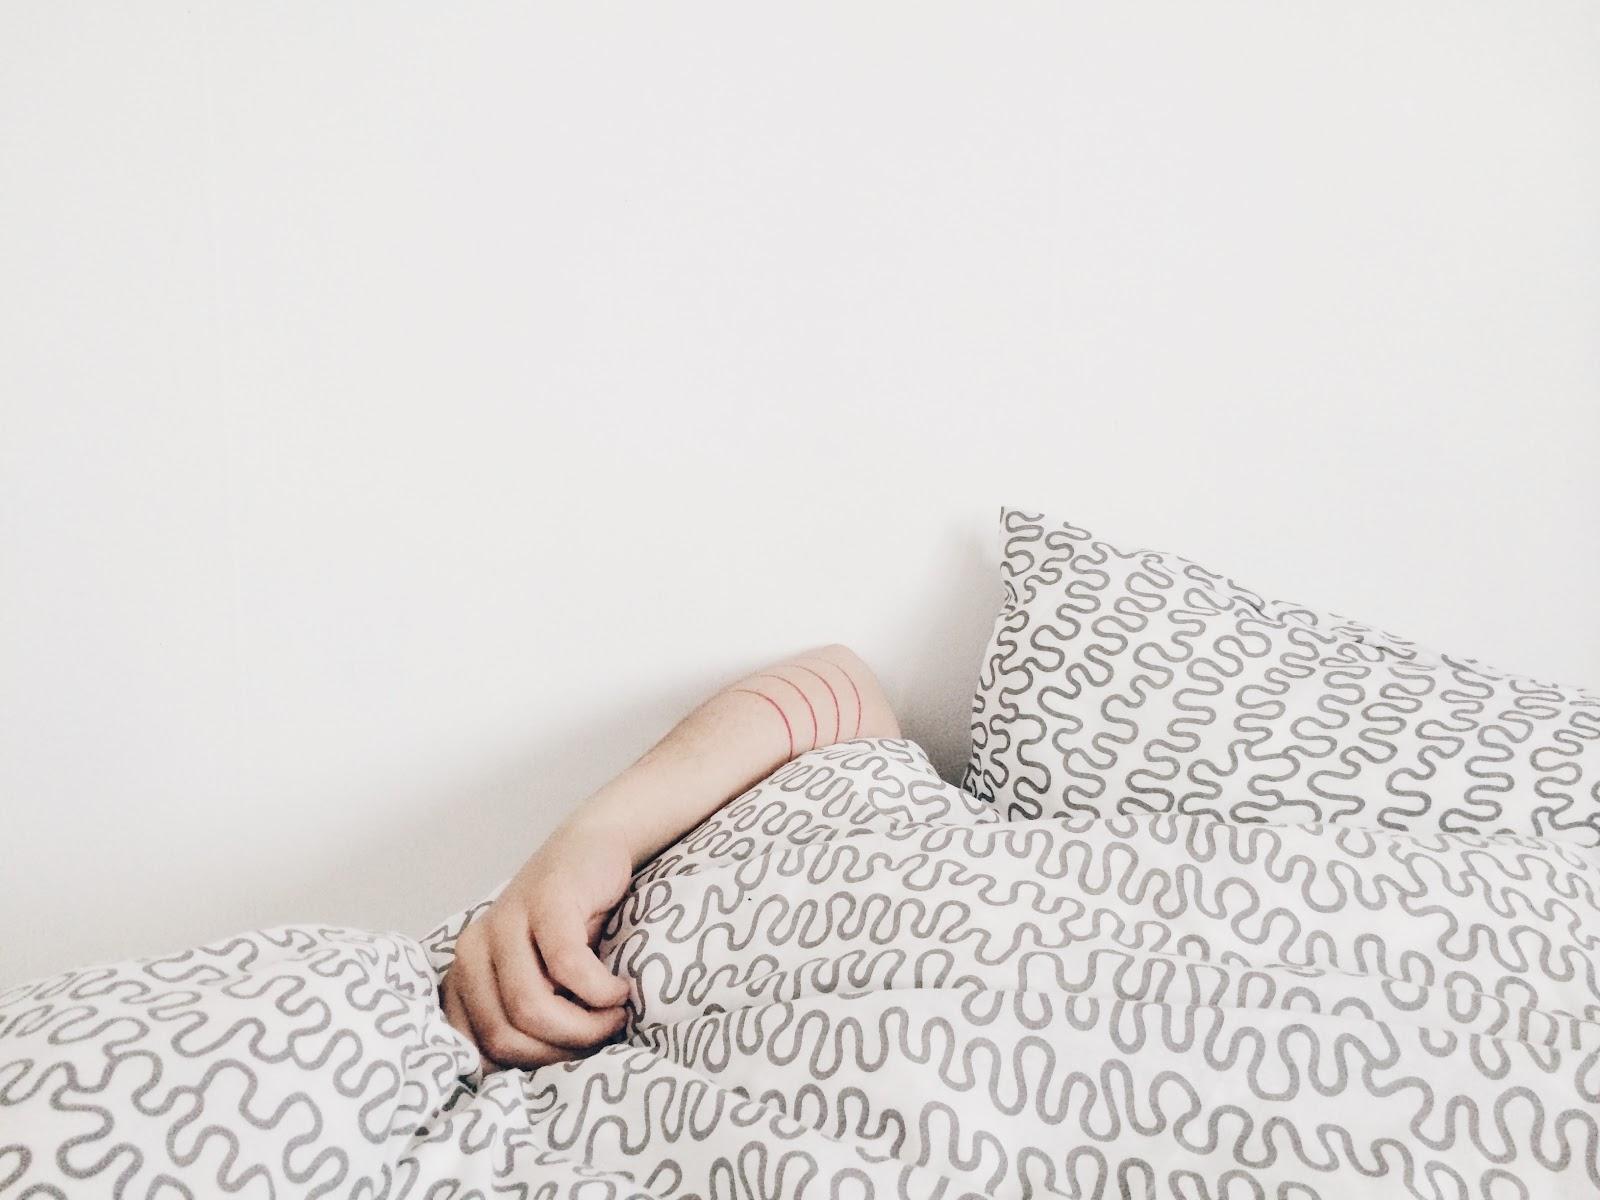 Why I am so lazy (Top 7 reasons)